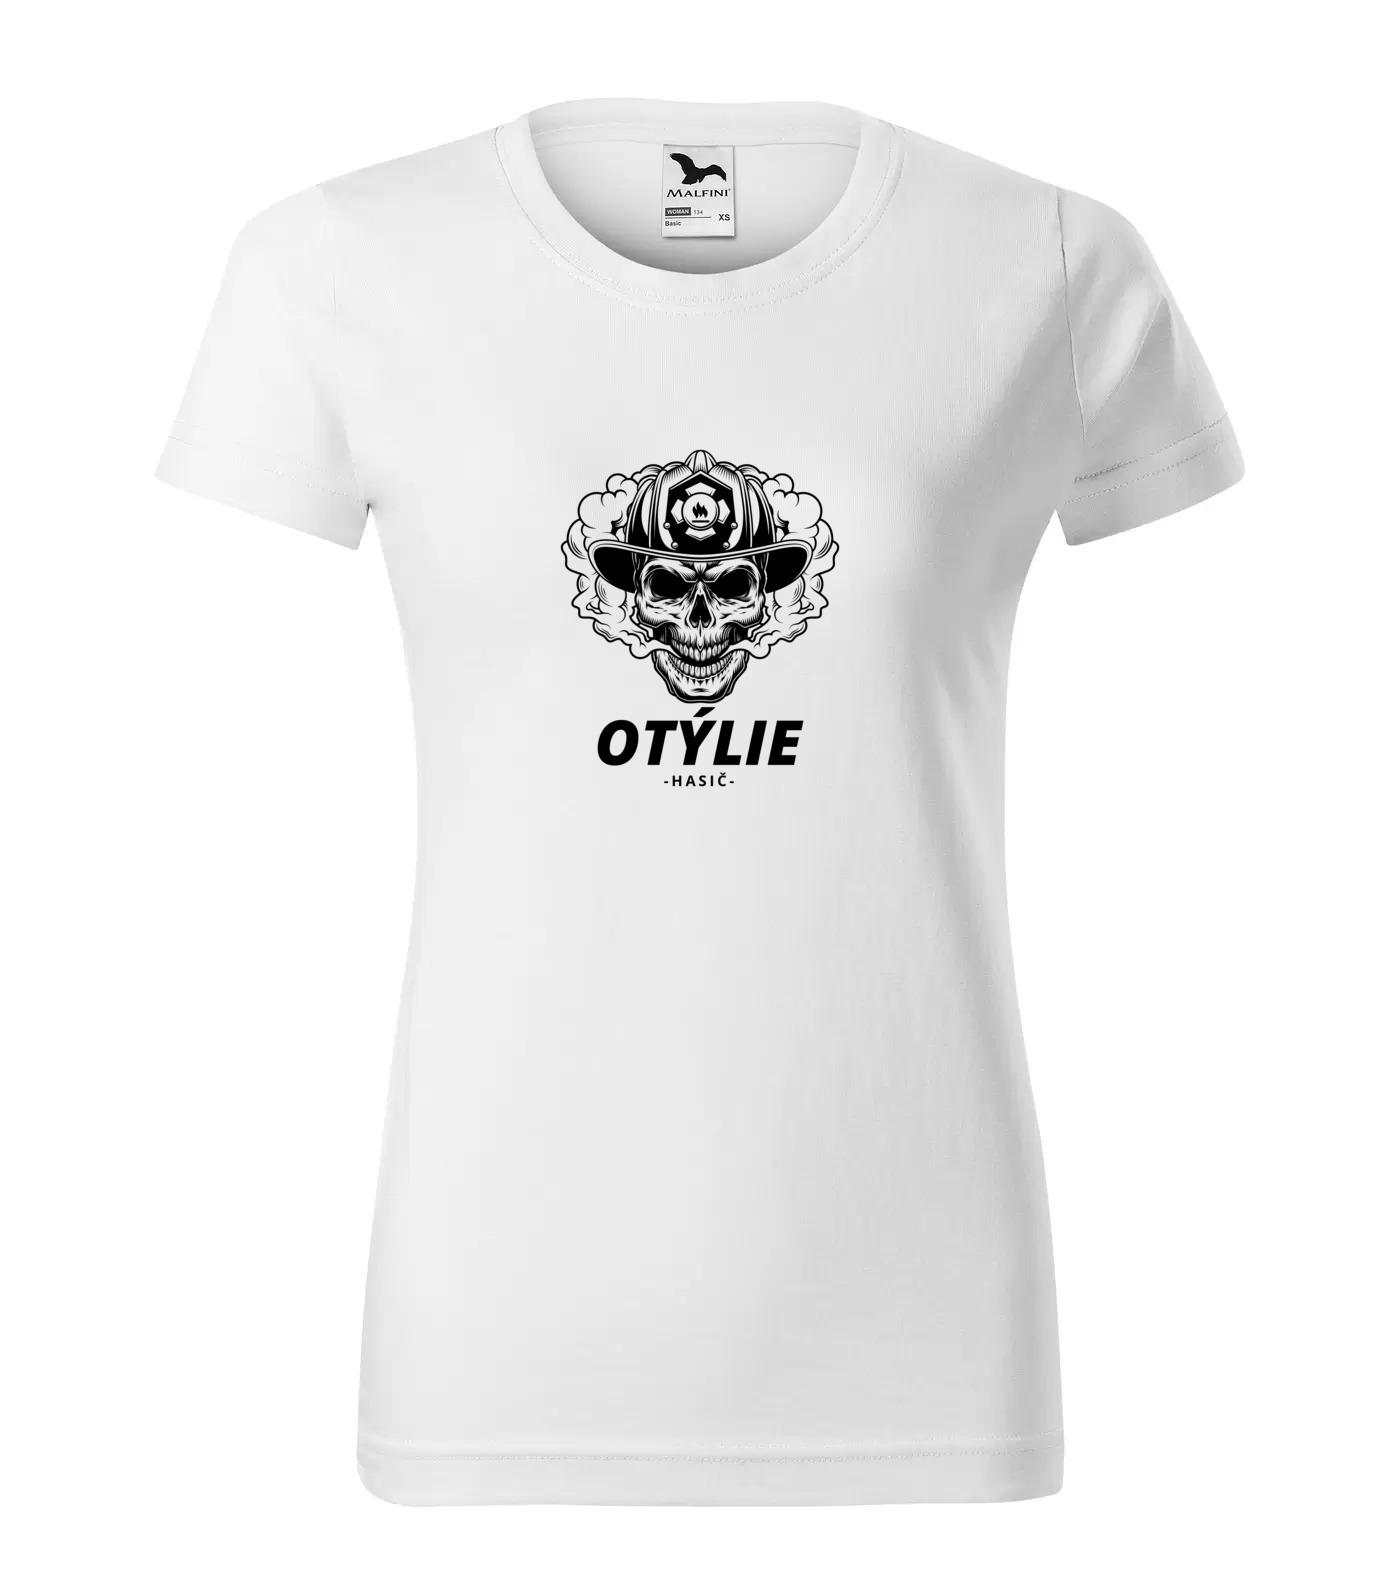 Tričko Hasič Otýlie